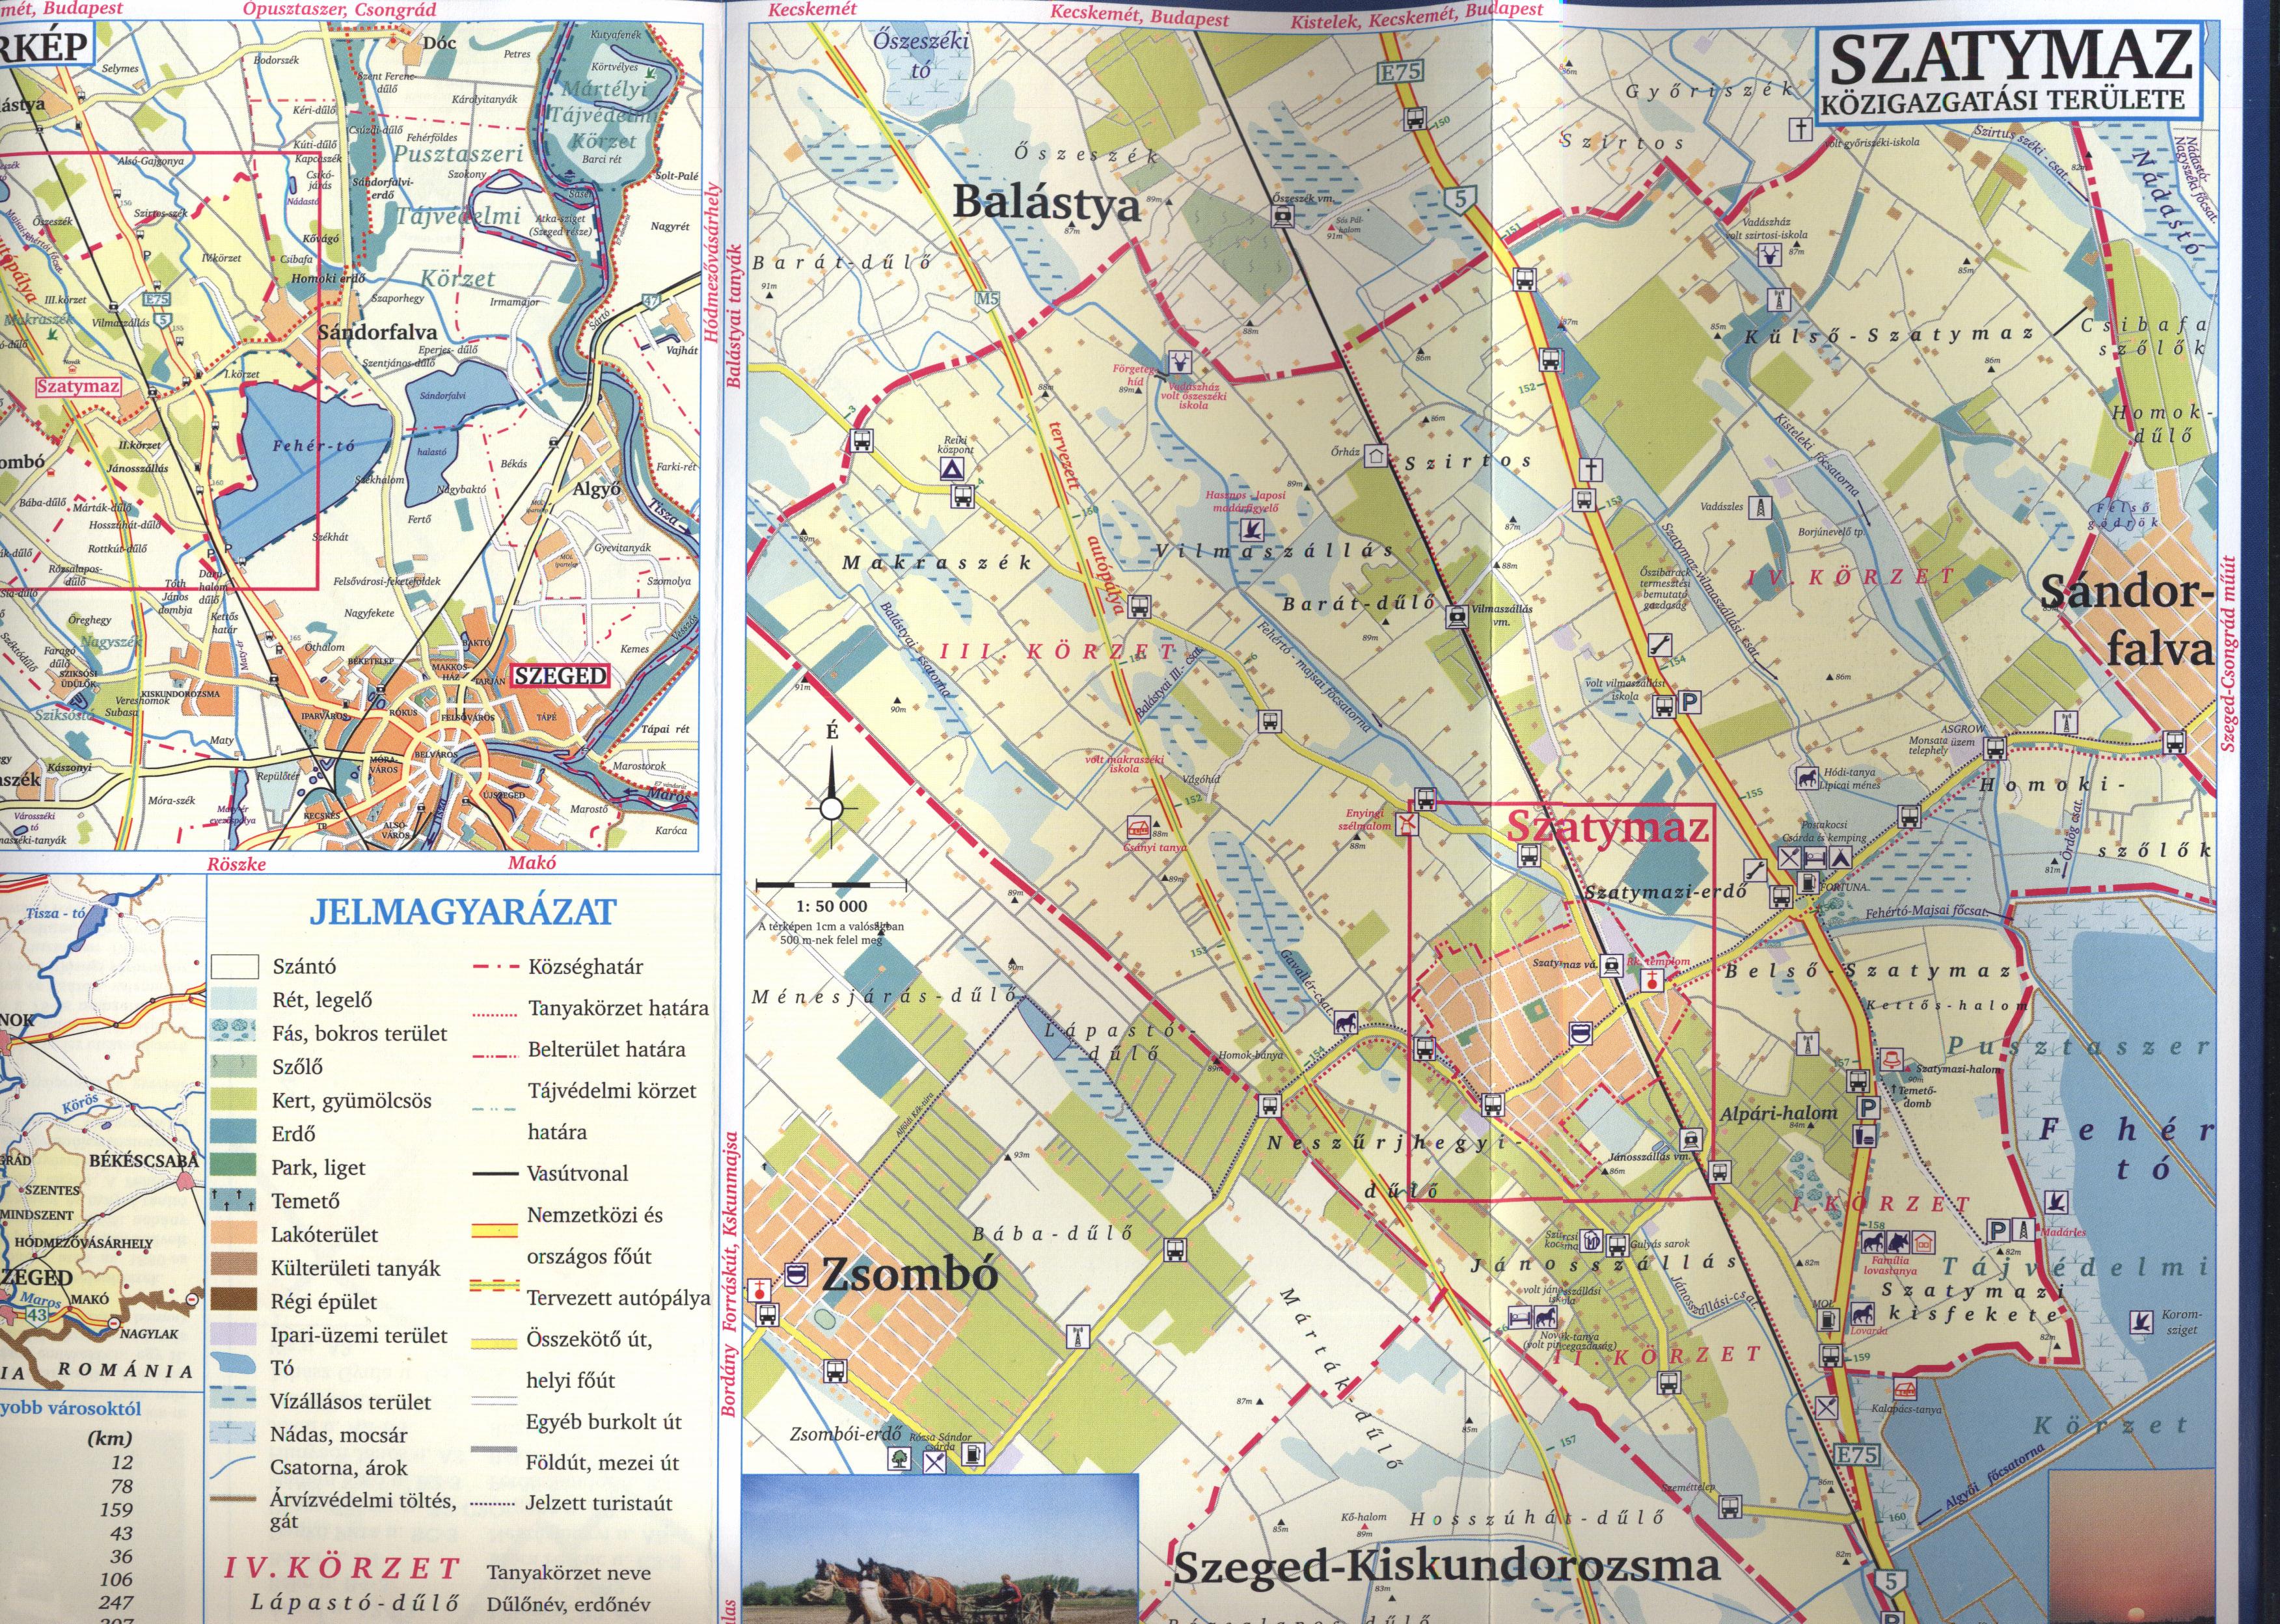 szatymaz térkép Térképek szatymaz térkép